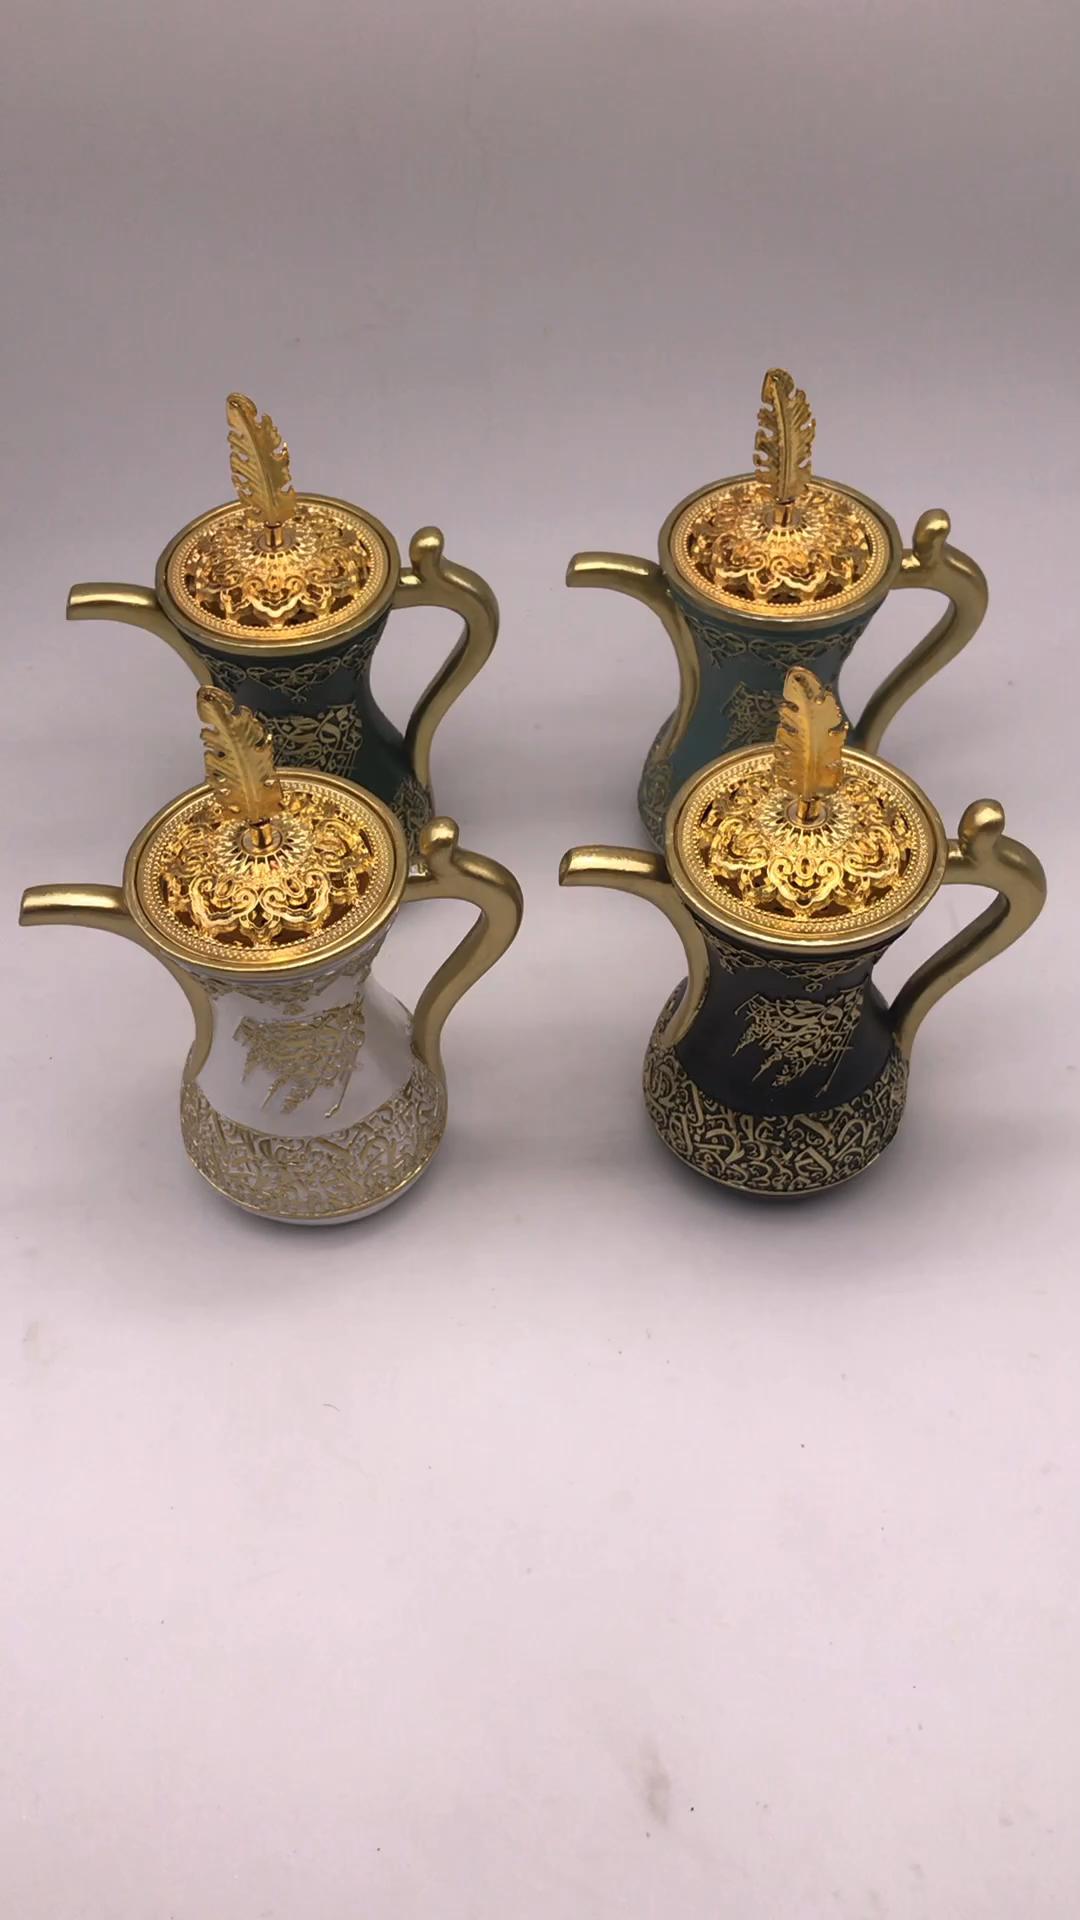 Hot sale 2020 New Resin Mubkhar Arabic Incense Burner Sets Wholesale